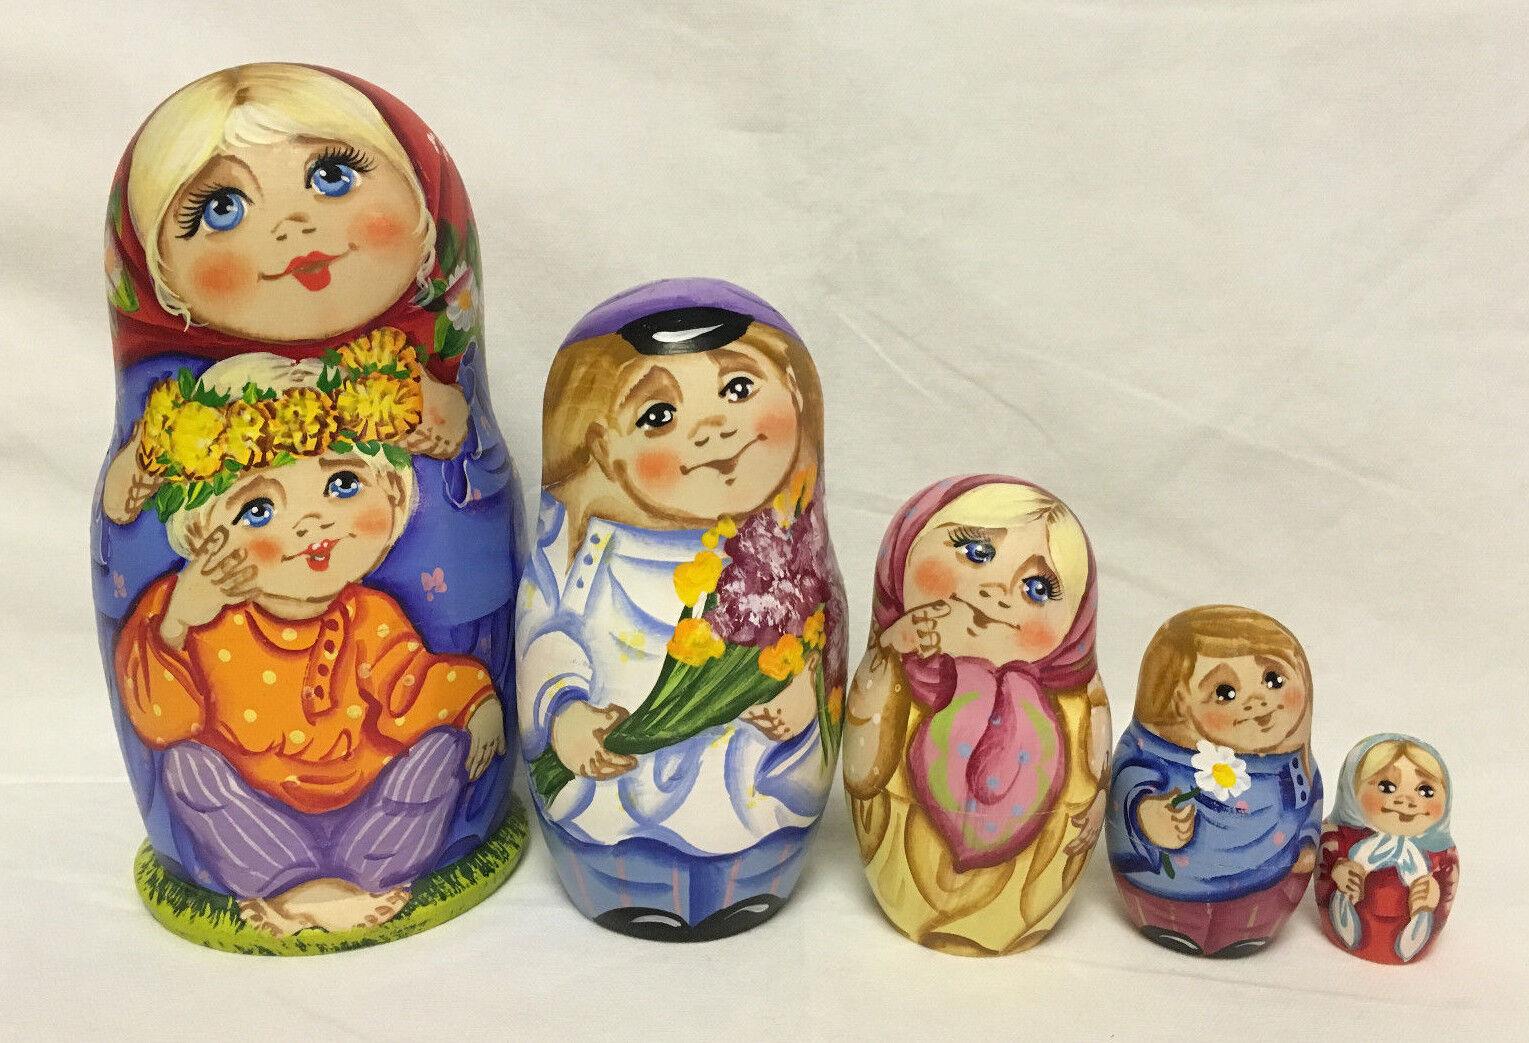 Russian Matryoshka Russian Wooden Nesting Dolls - 5 pieces  8